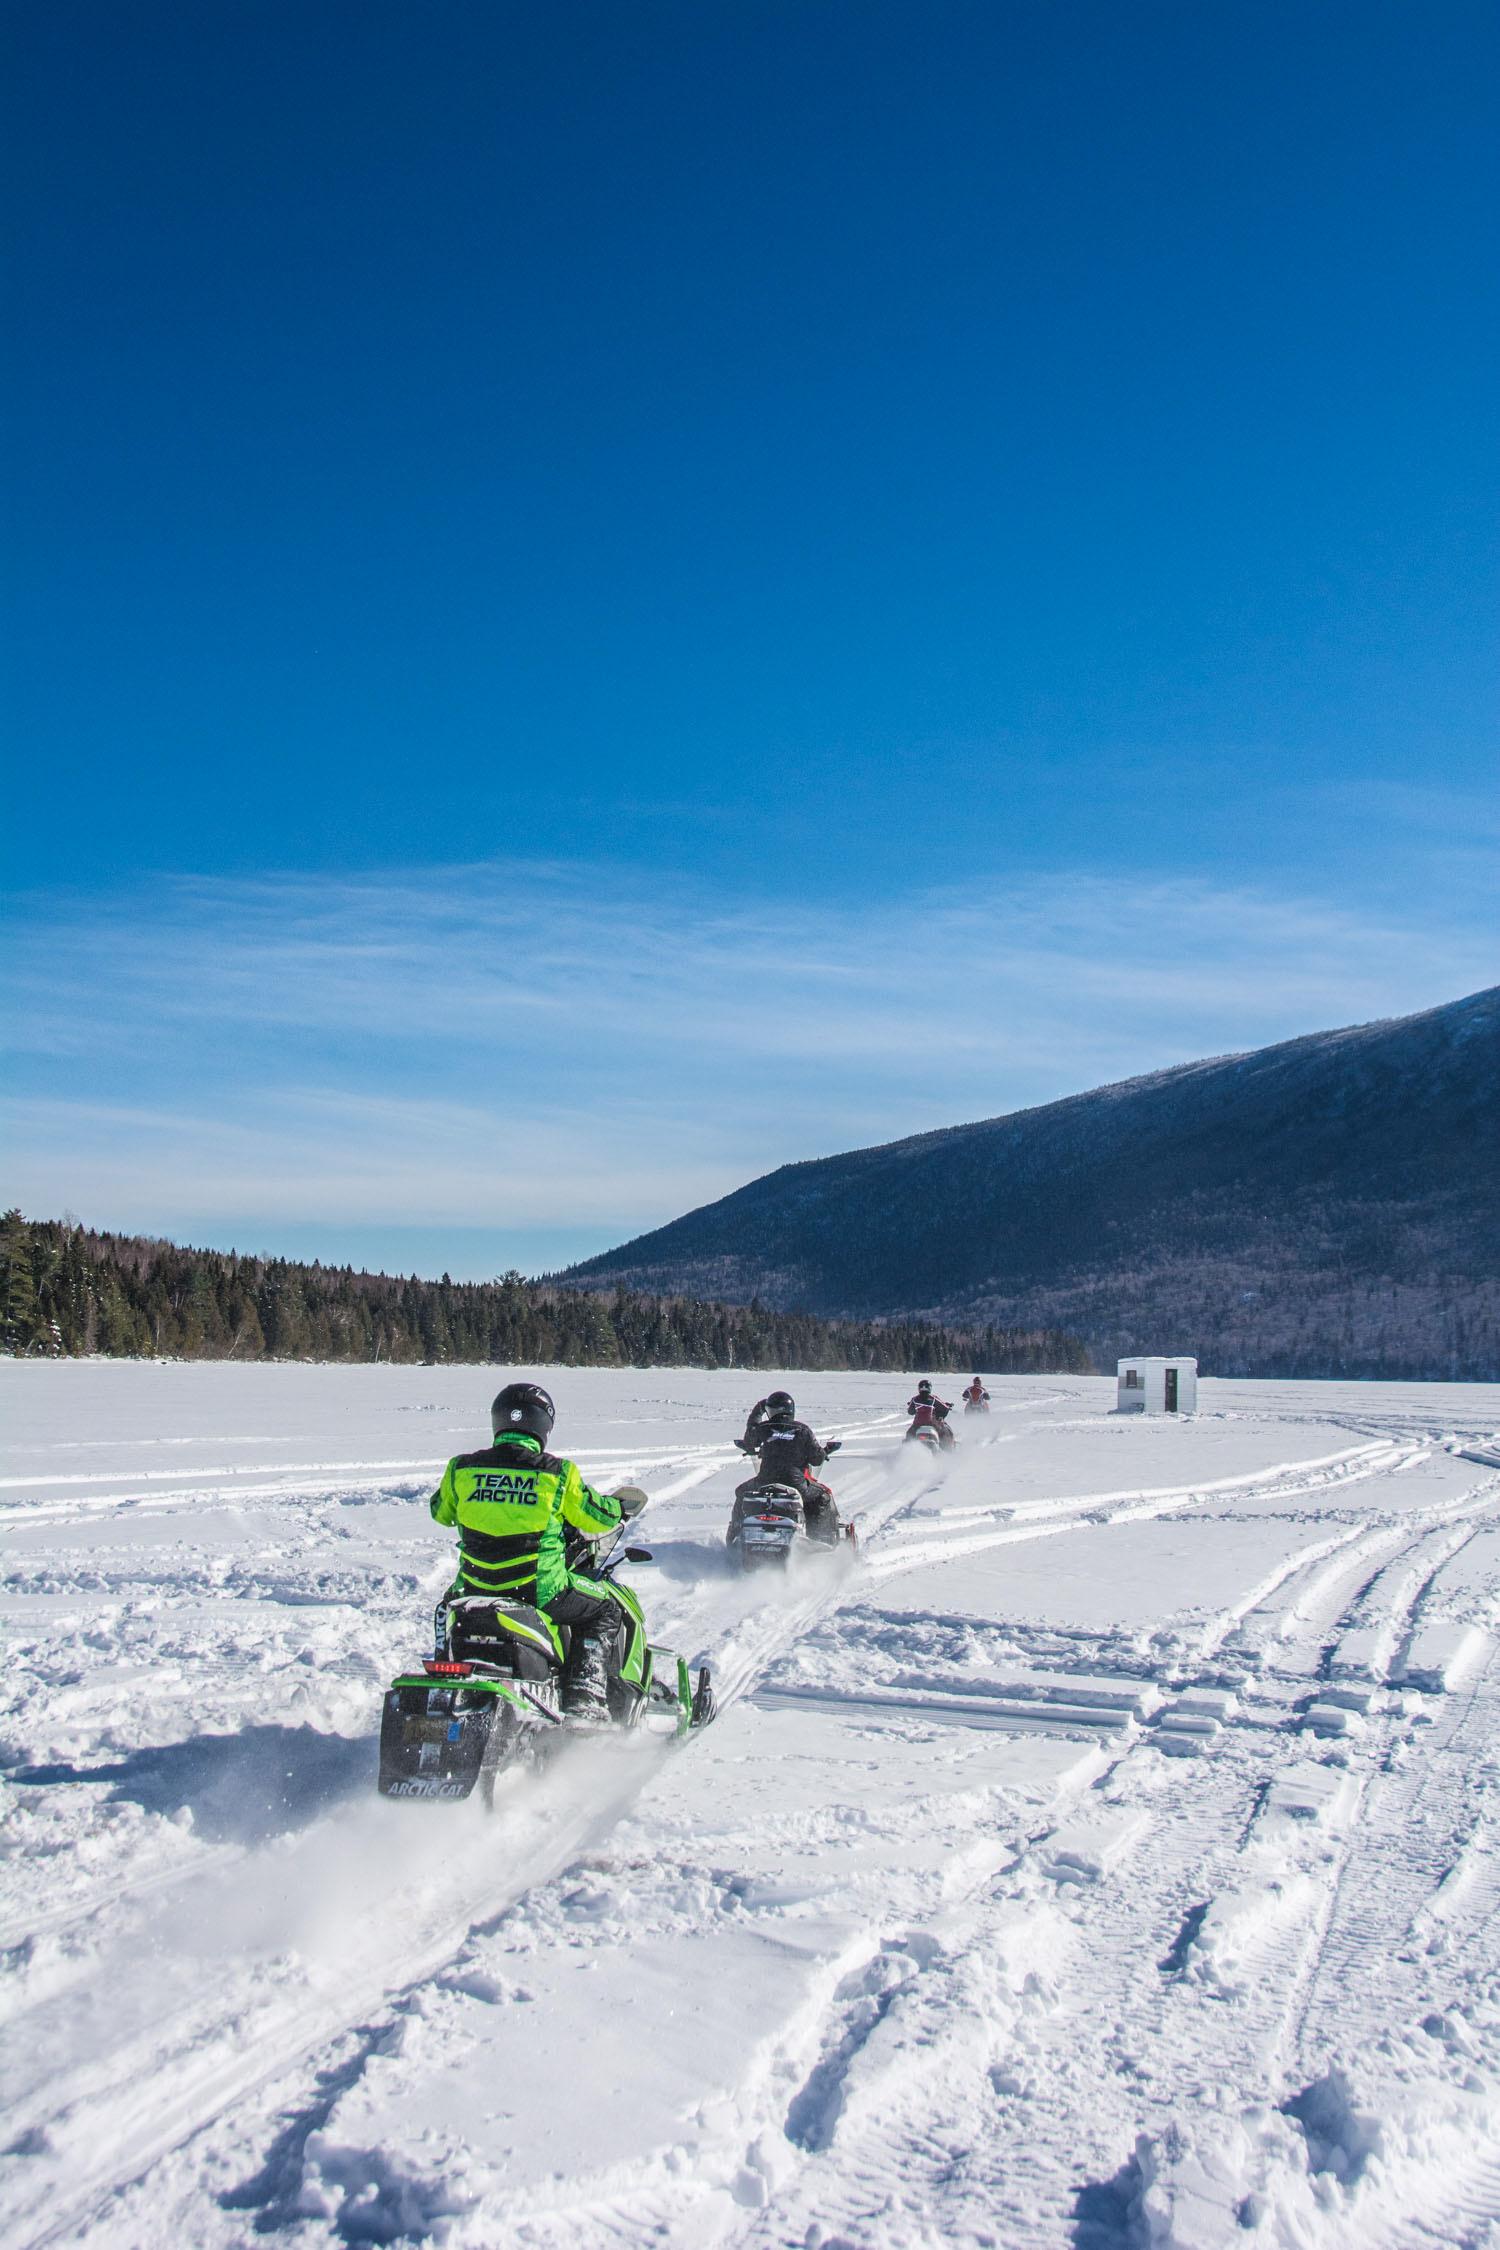 feb10-11 2015-Tourism New Brunswick-T4G Kick-winter 2015-New Brunswick Great Northern Odyssey-snowmobile trip-Mount Carleton-NB-photo by Aaron McKenzie Fraser-www.amfraser.com-_AMF4807.jpg